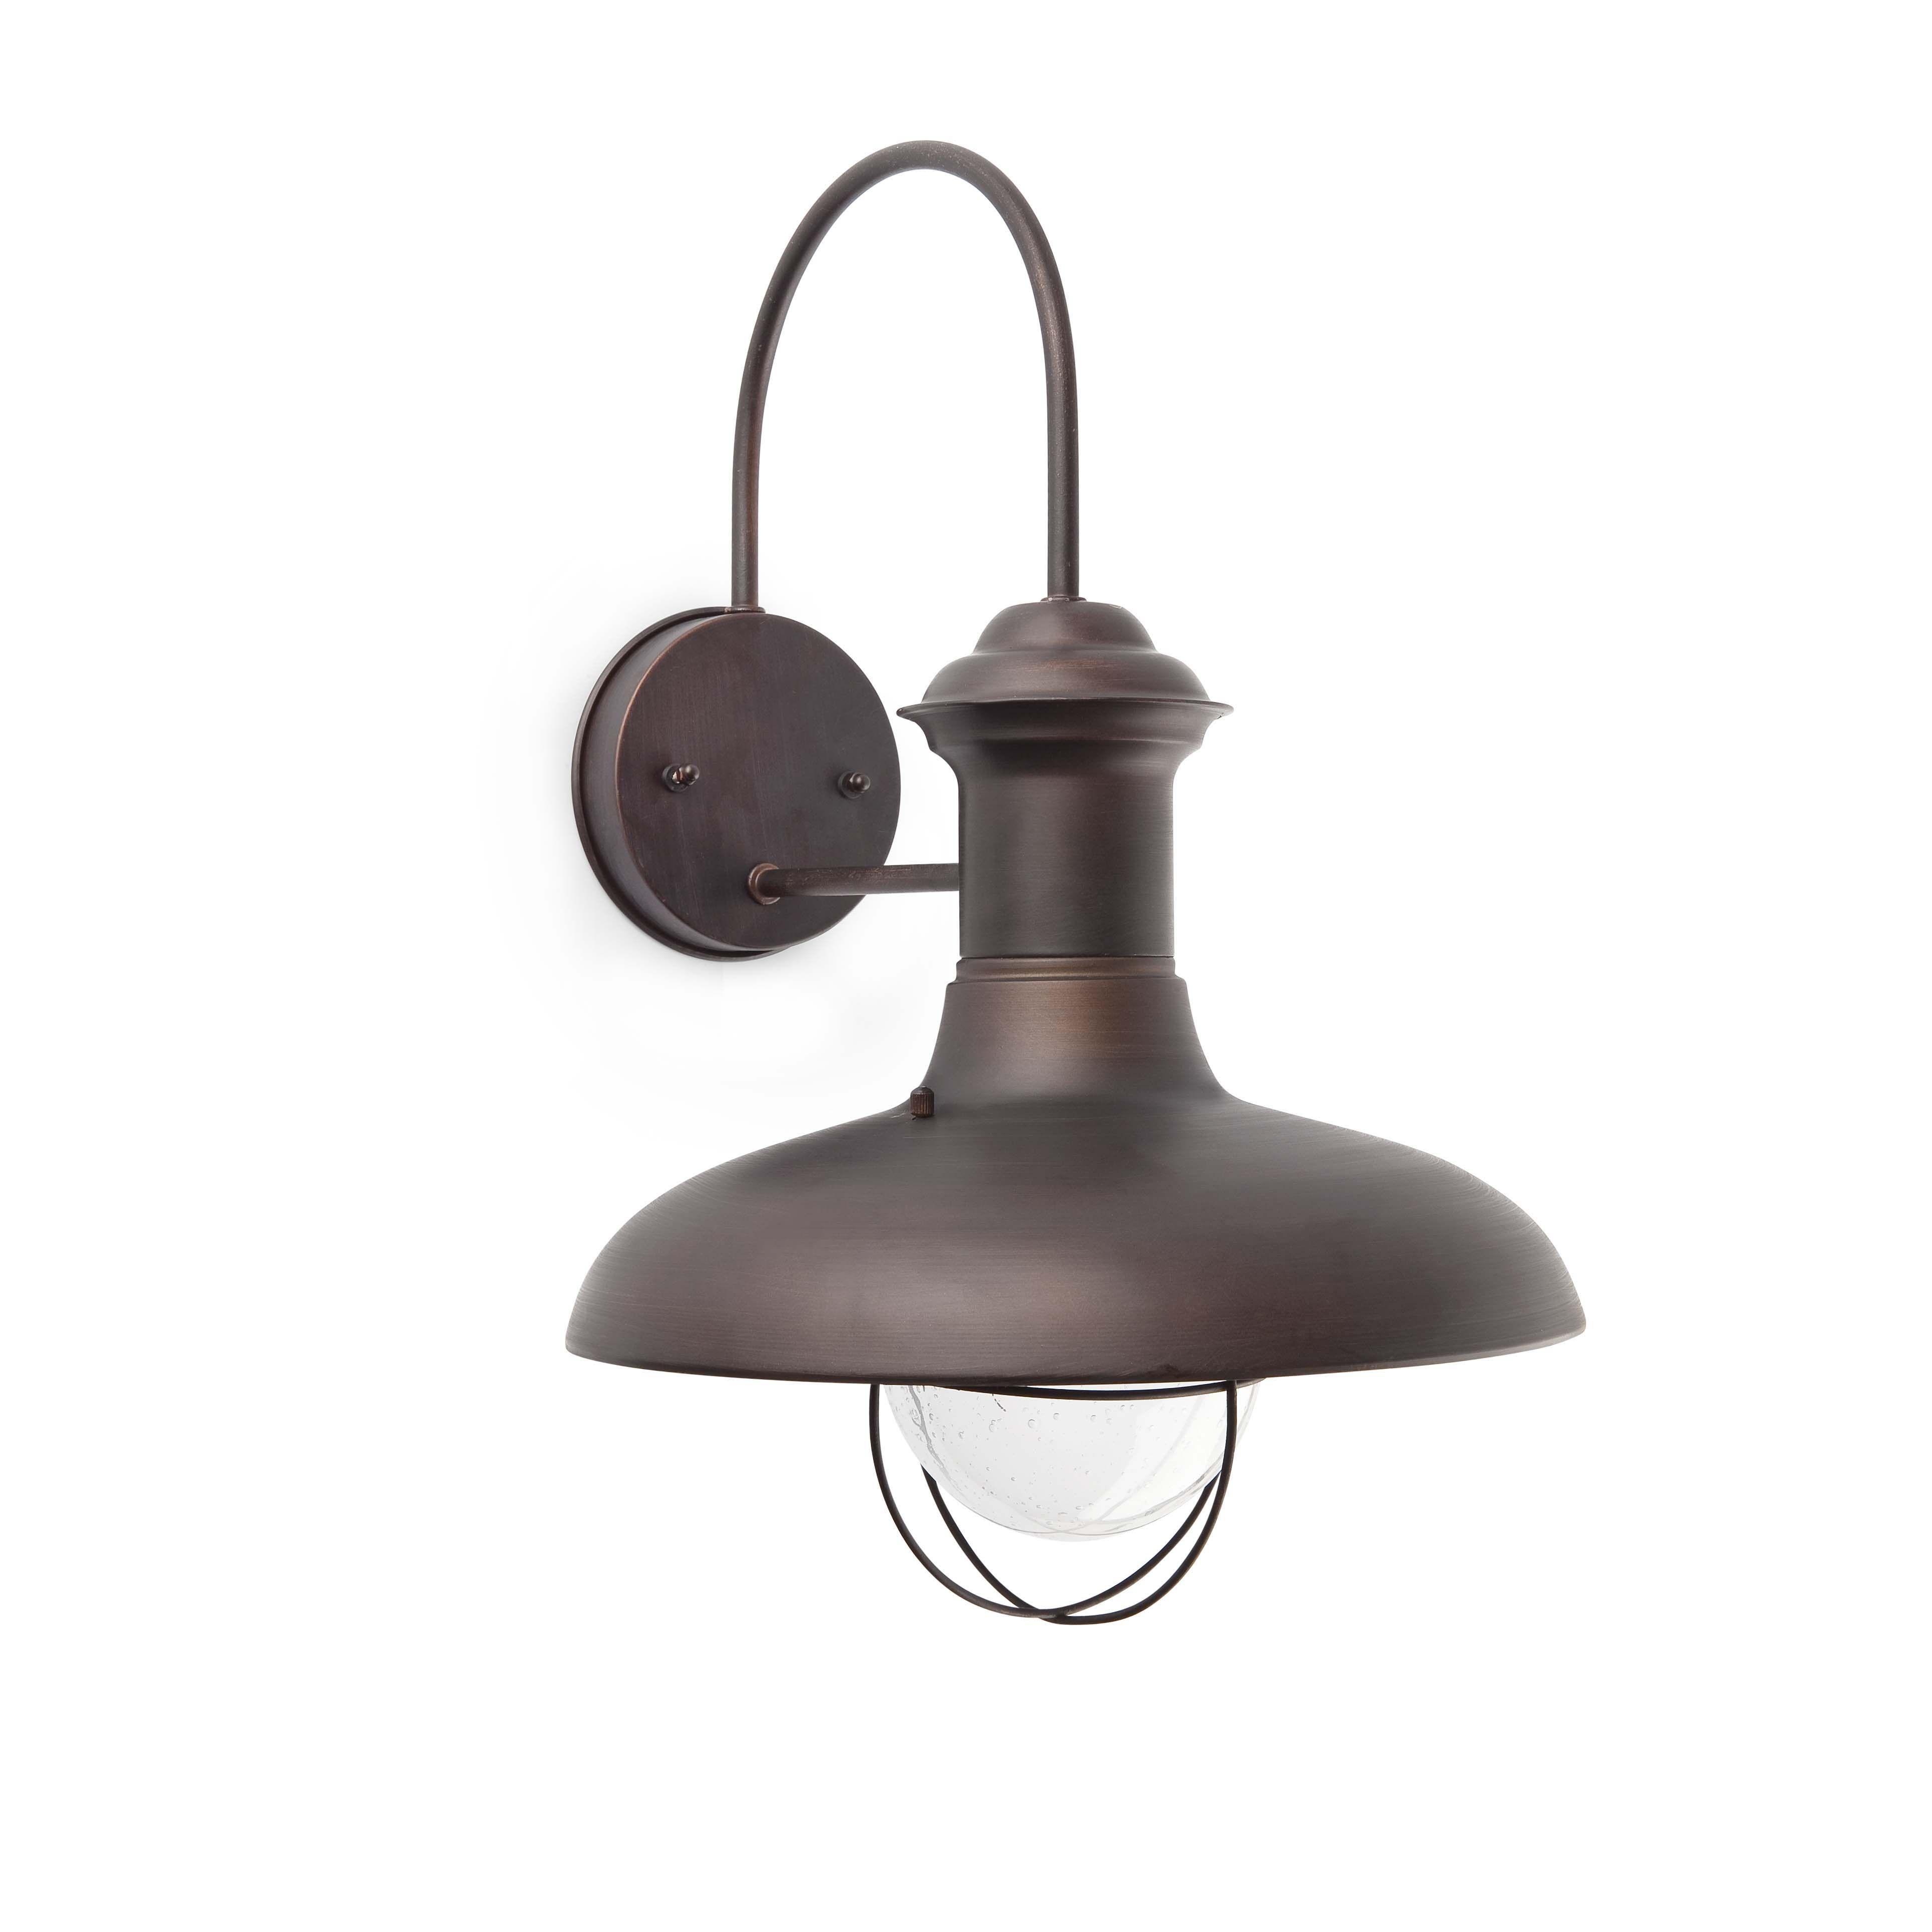 Klassieke wandlamp estoril groot roestkleurig 8071141 esr - Iluminacion estilo industrial ...